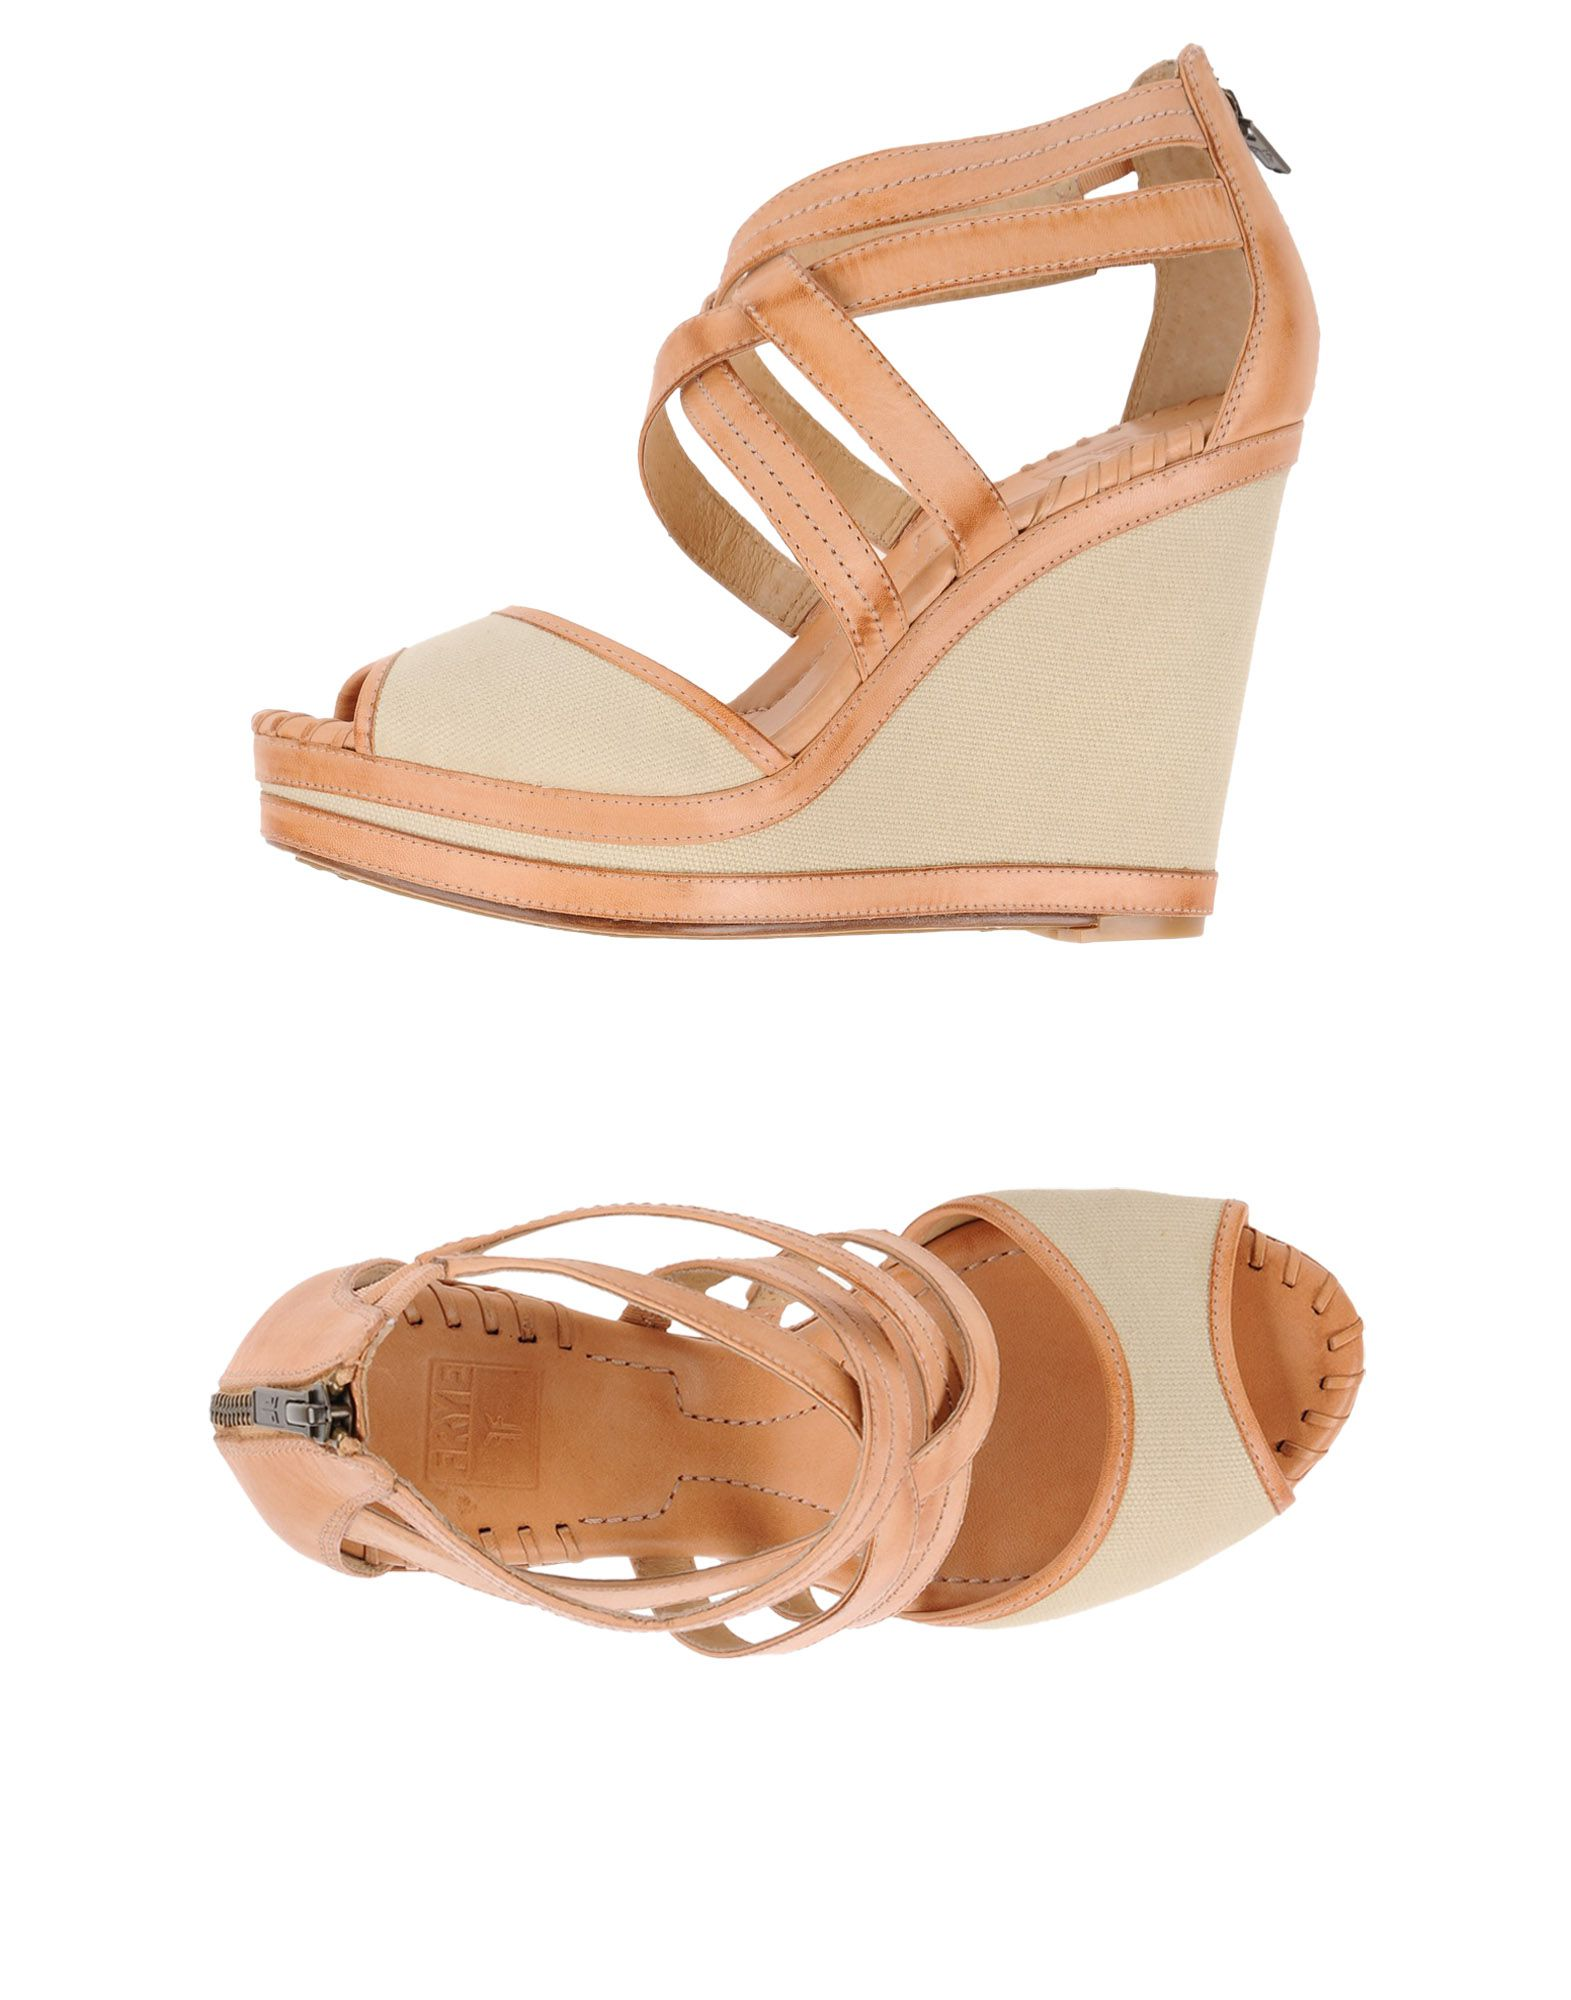 Frye Sandalen Gute Damen  11207205WS Gute Sandalen Qualität beliebte Schuhe 6db1cd